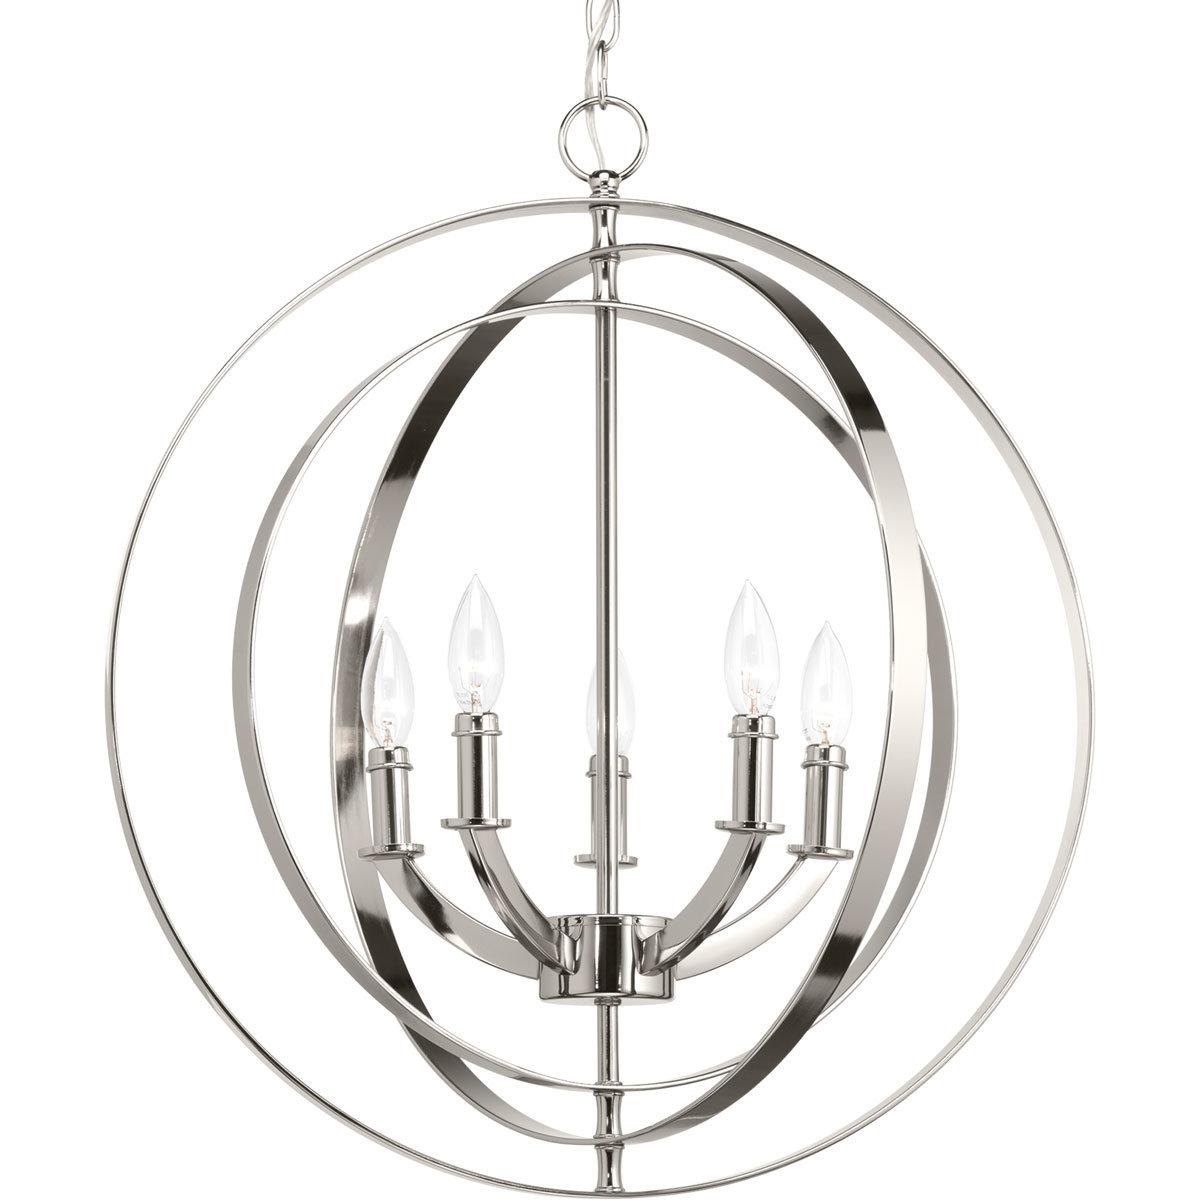 Morganti 5-Light Globe Chandelier pertaining to Morganti 4-Light Chandeliers (Image 19 of 30)